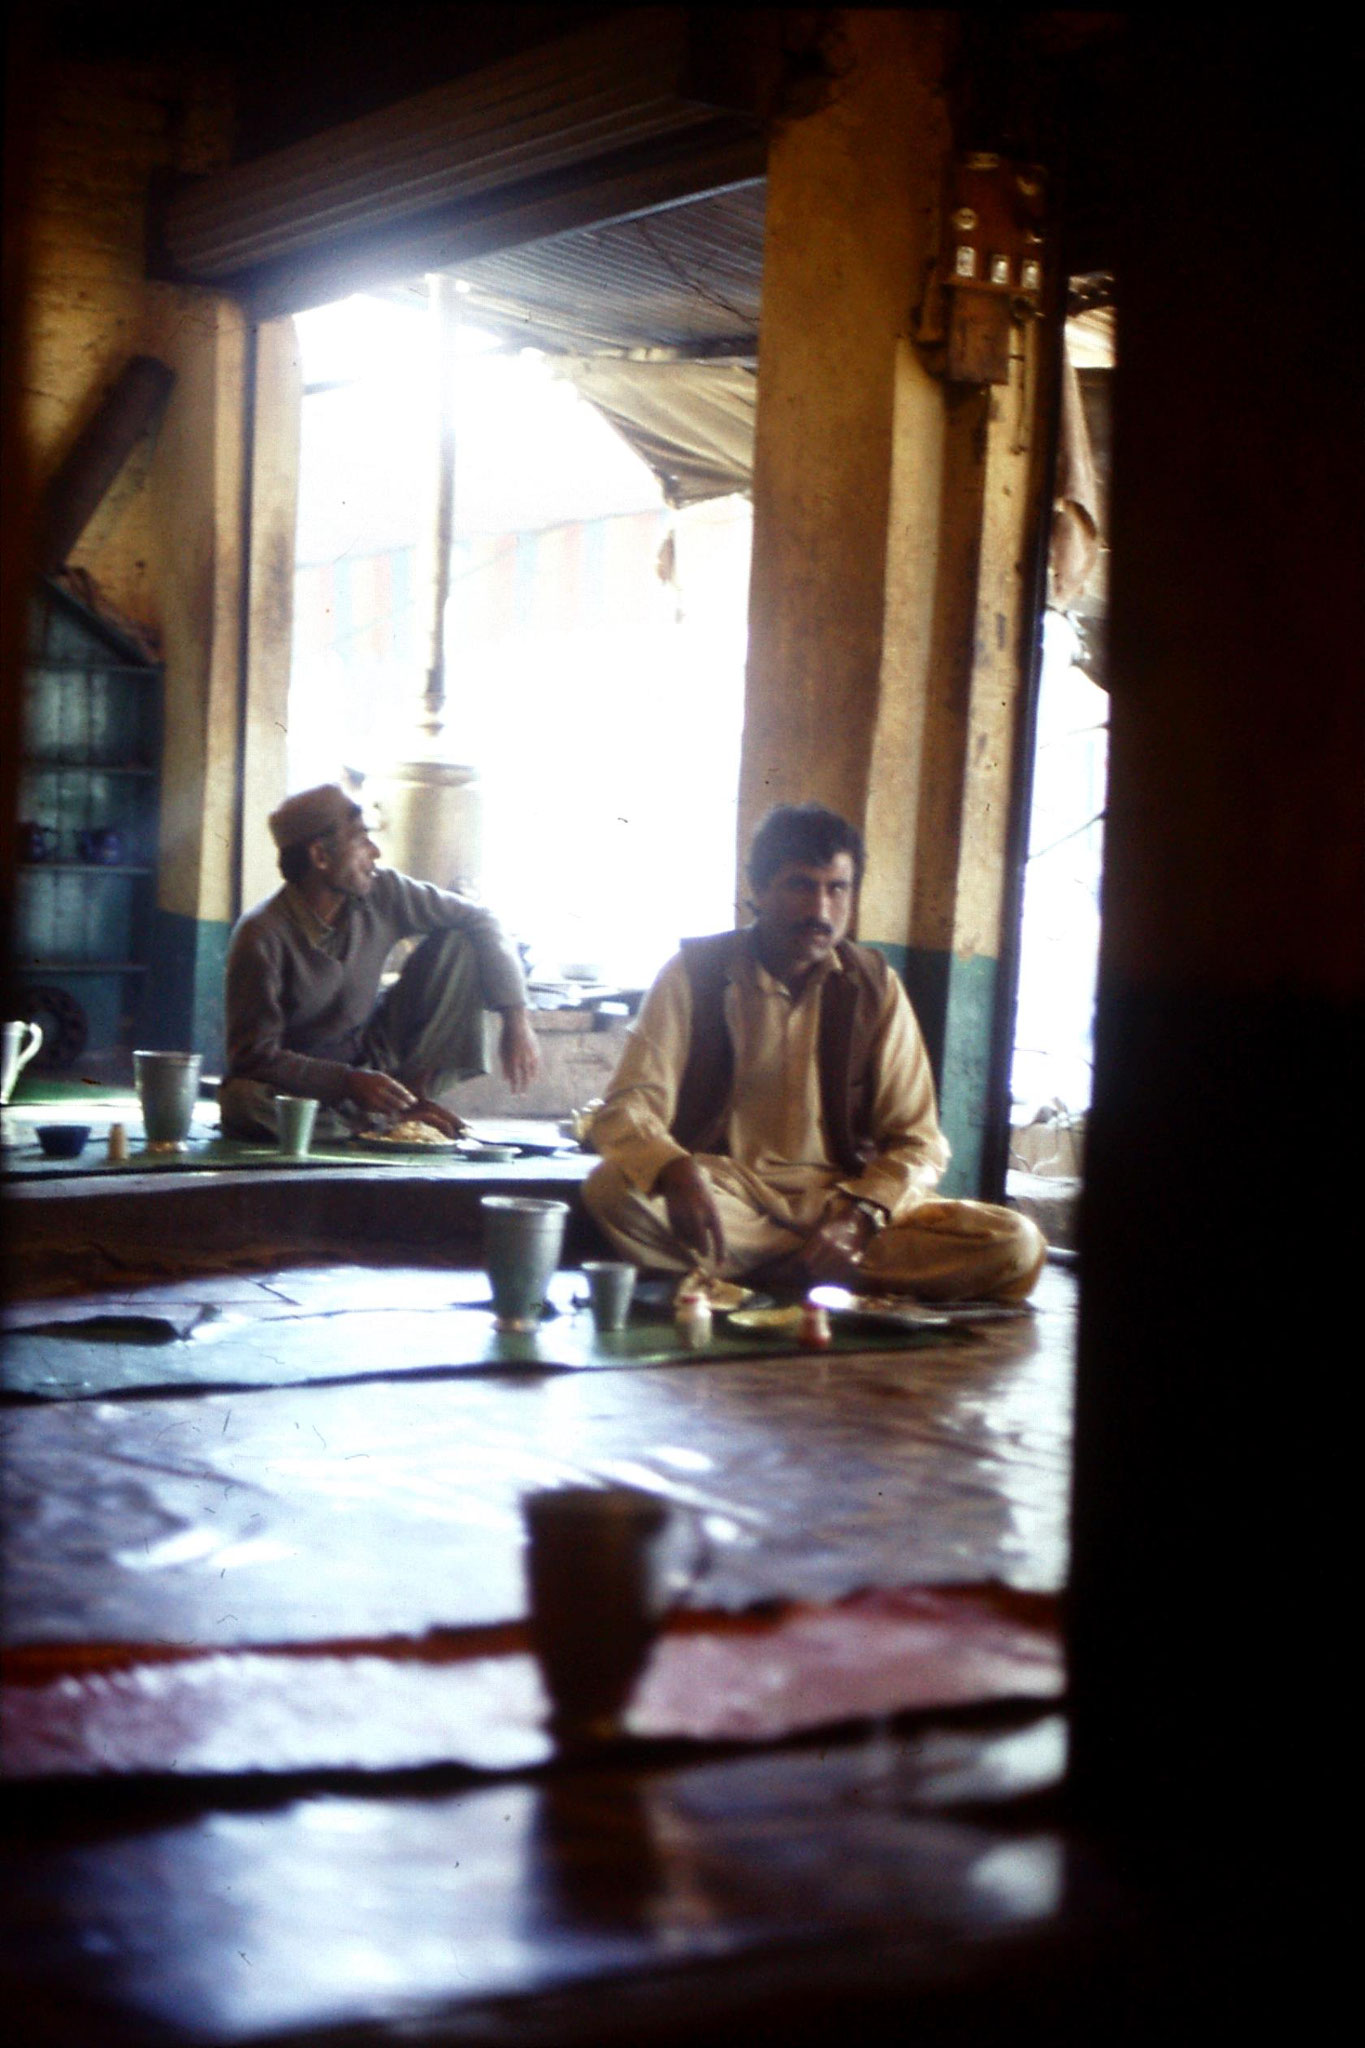 6/11/1989: 21: Afghan restaurant